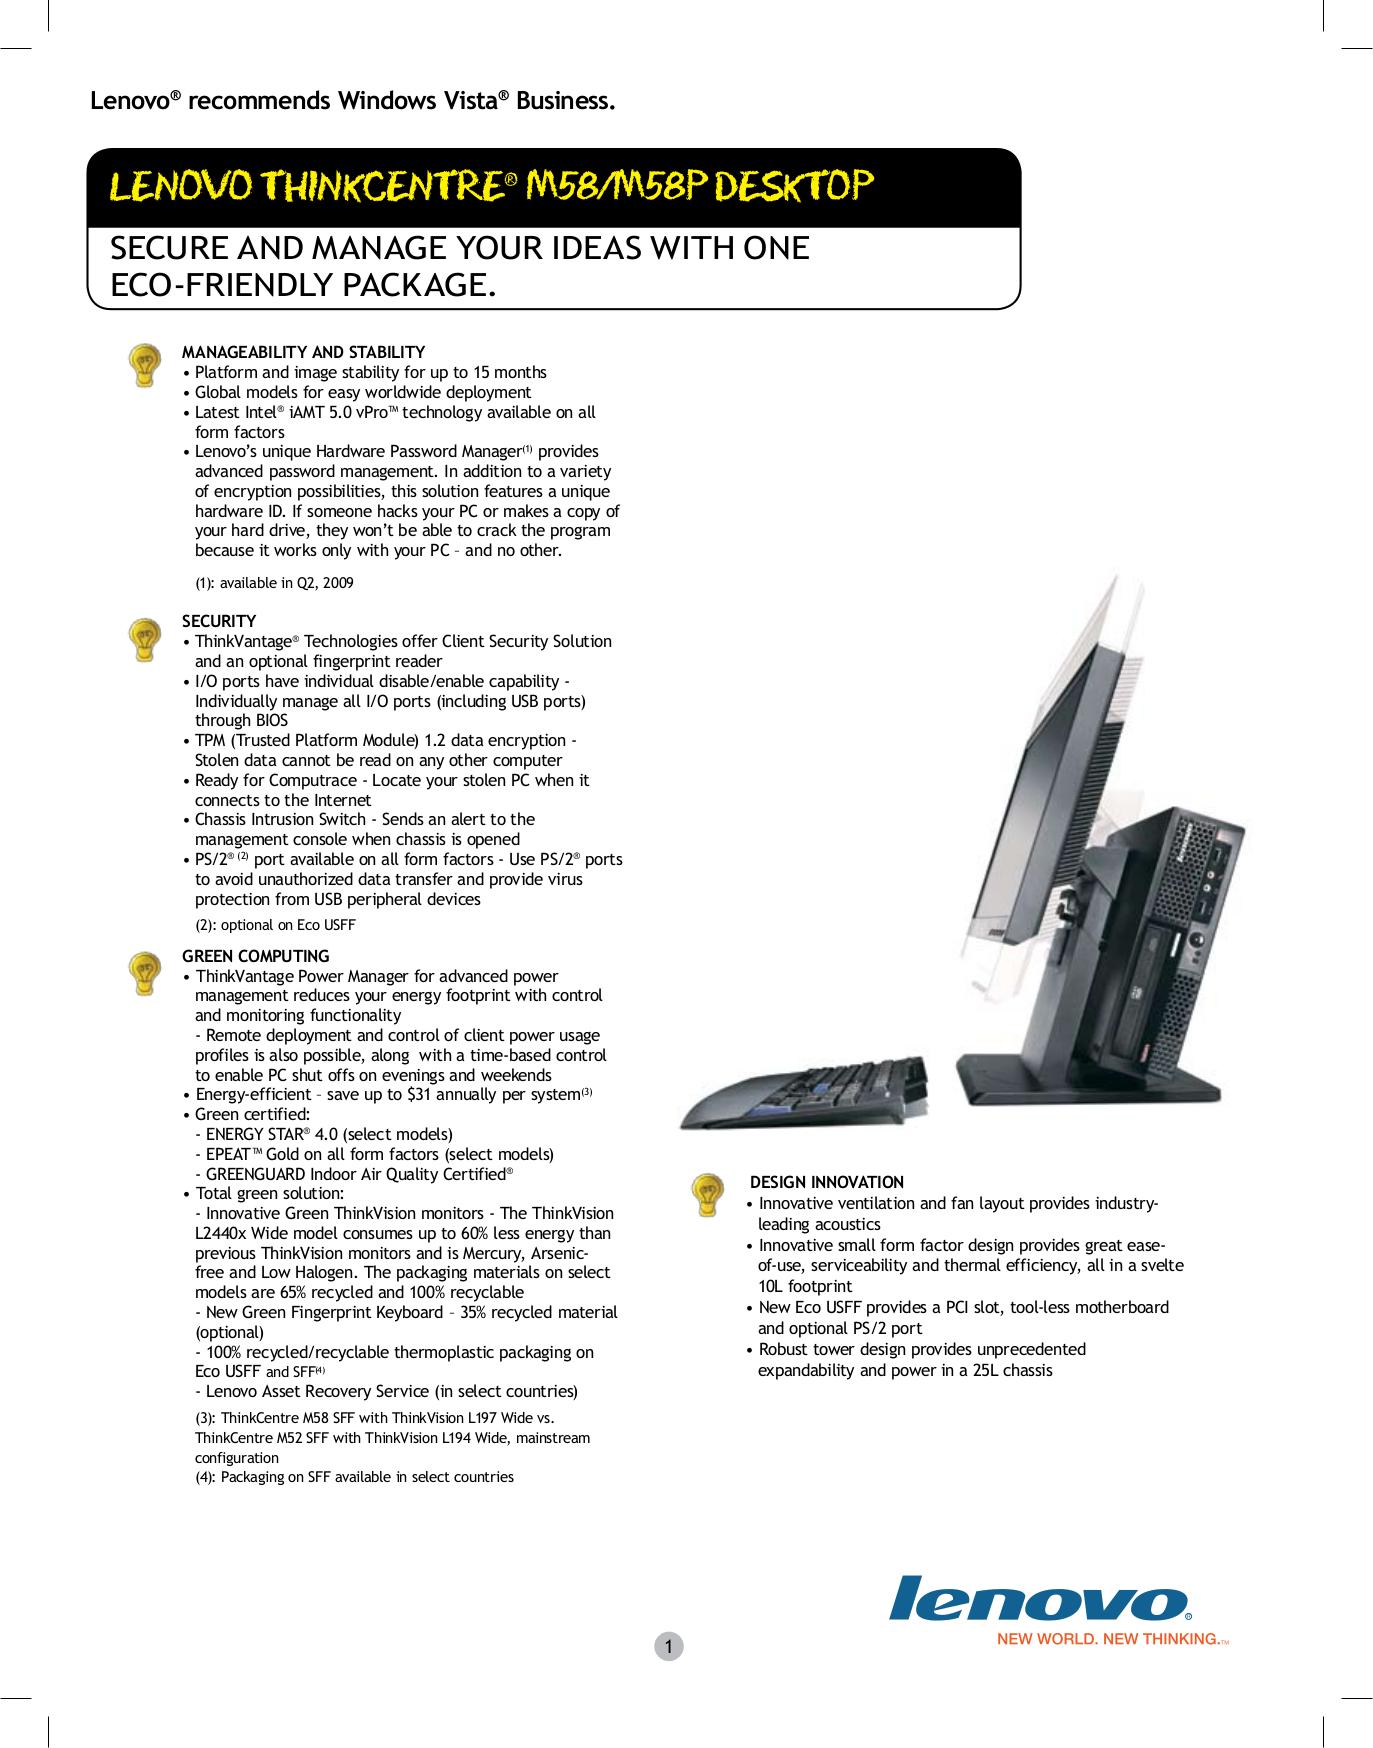 pdf for Lenovo Desktop ThinkCentre M58p 7358 manual